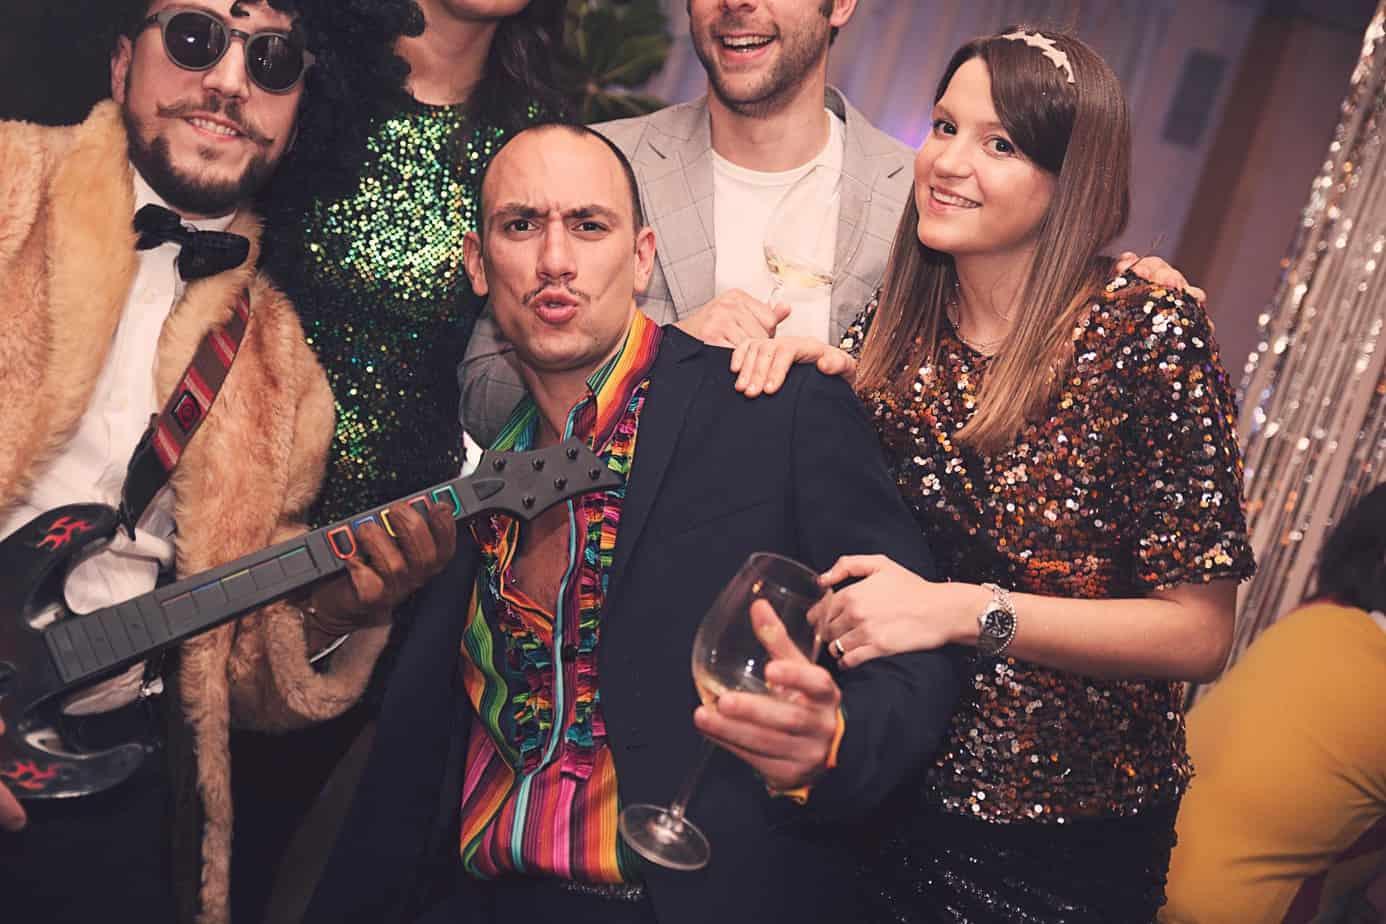 Carnival_Party_Tezzon_francescabandiera